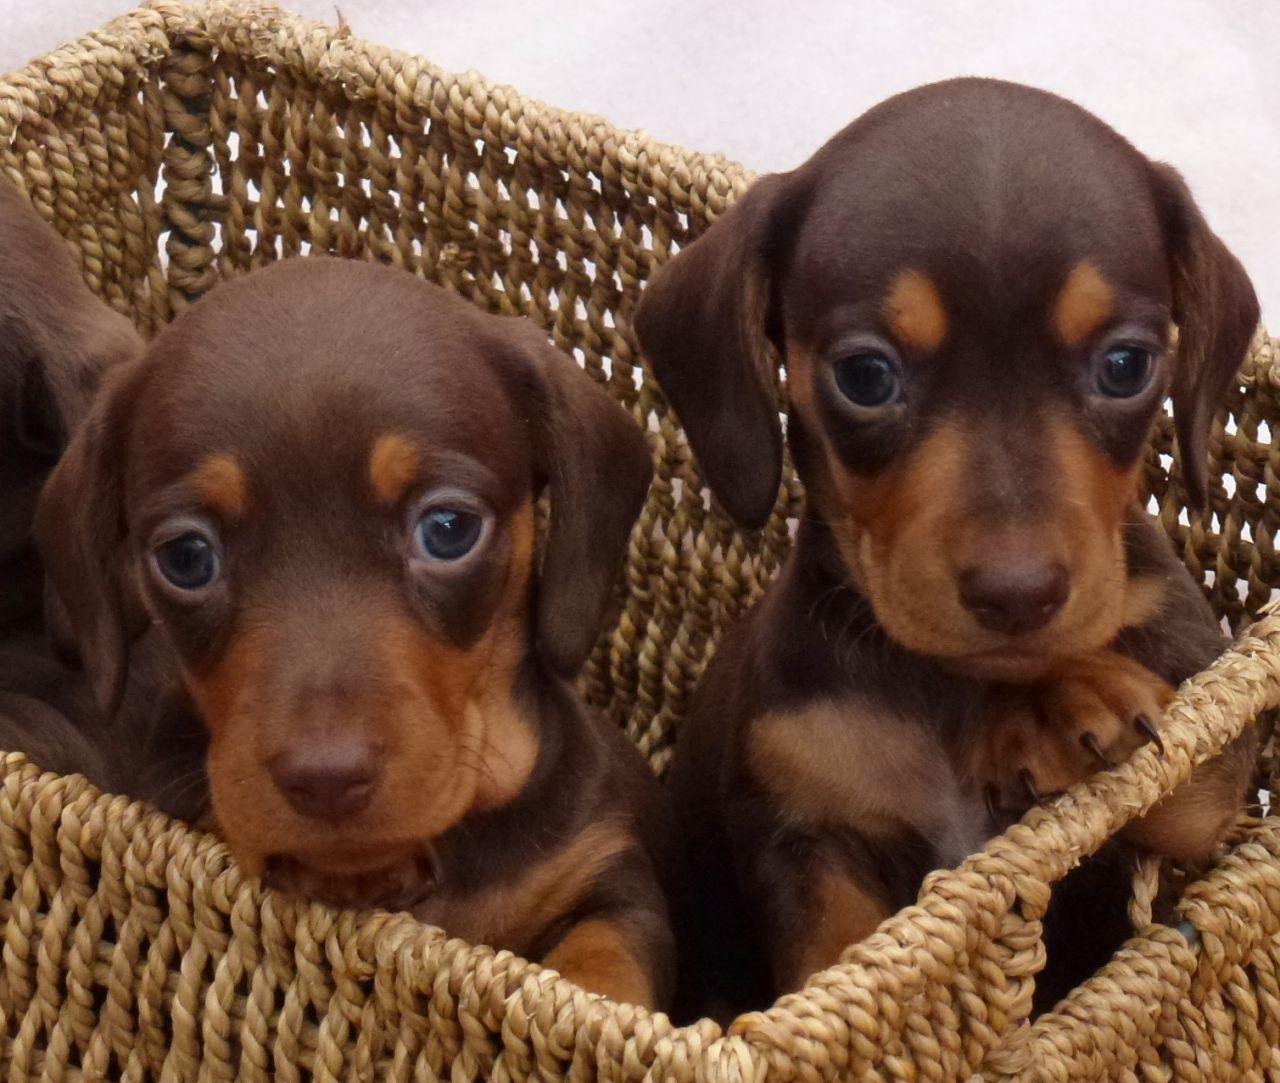 Chocolate And Tan Miniature Dachshund Puppies Nelson Lancashire Pets4homes Dachshund Puppy Miniature Daschund Puppies Dachshund Puppies